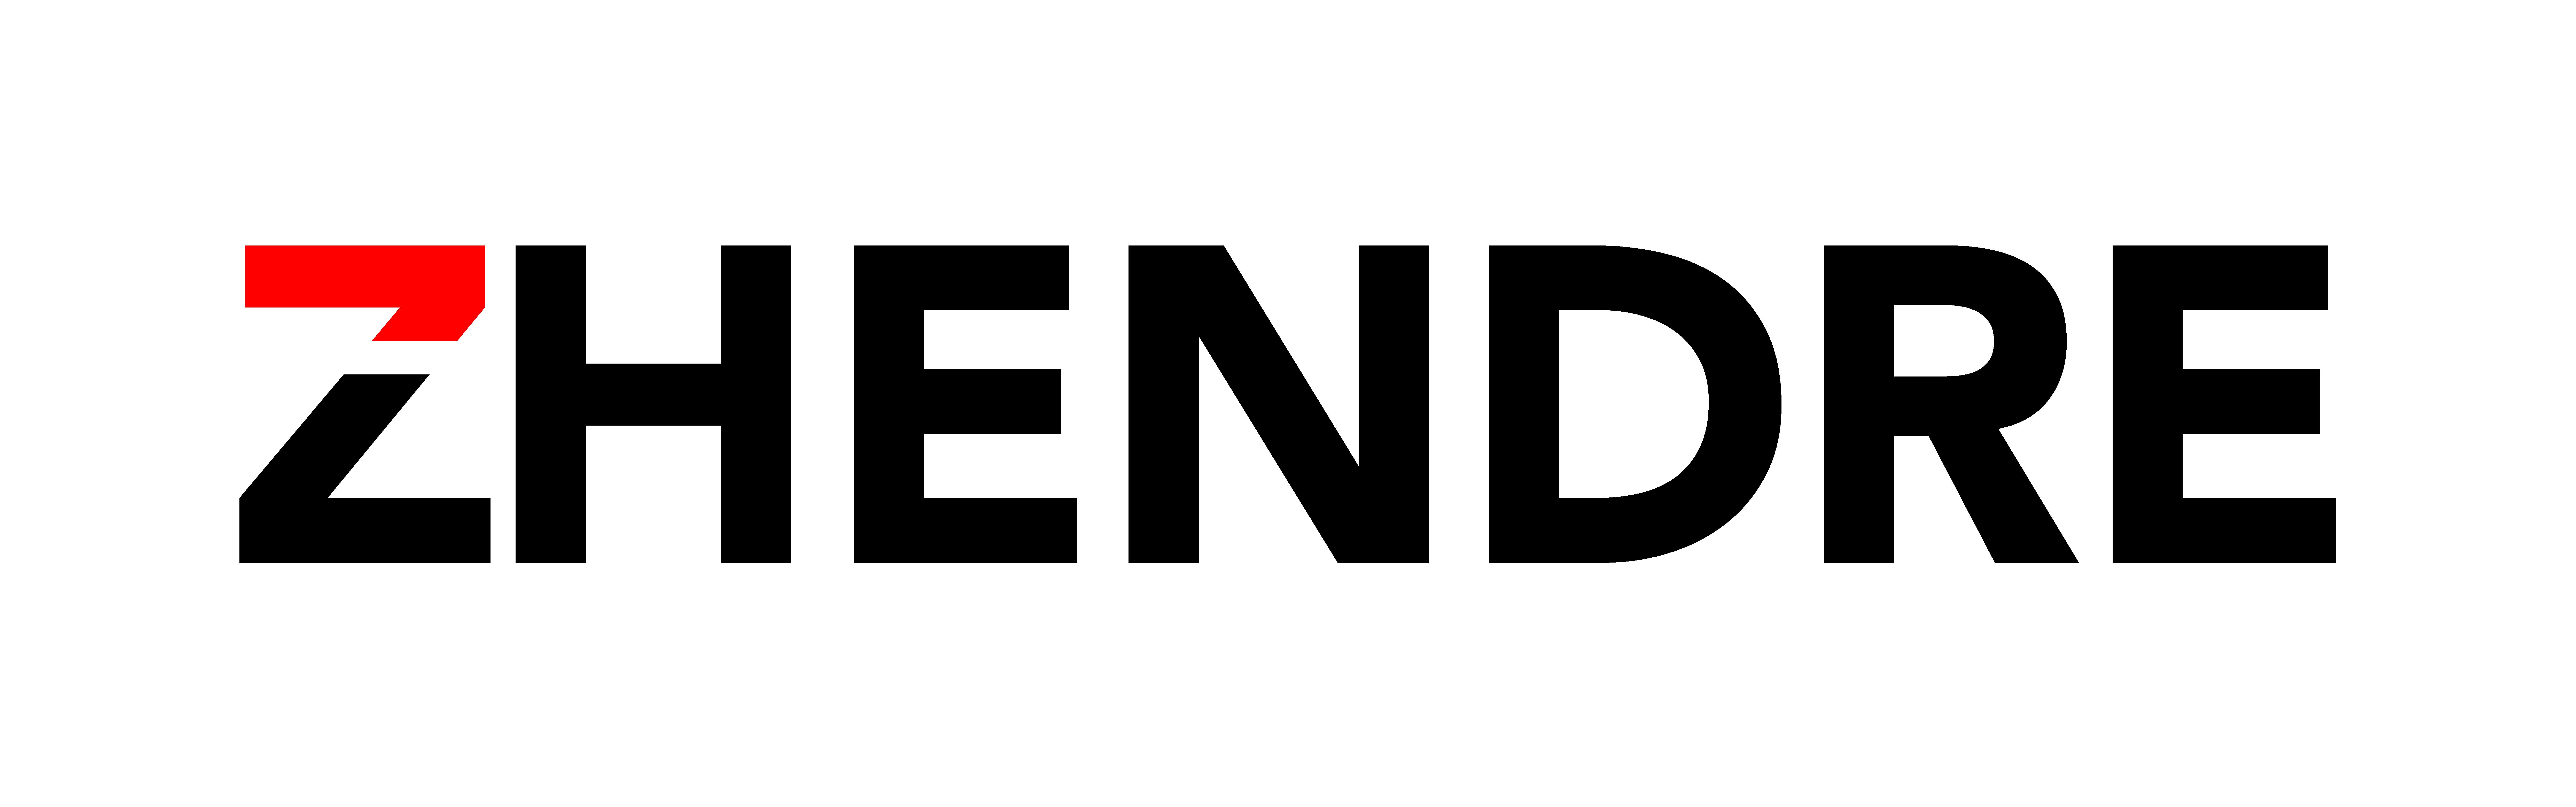 ZHENDRE